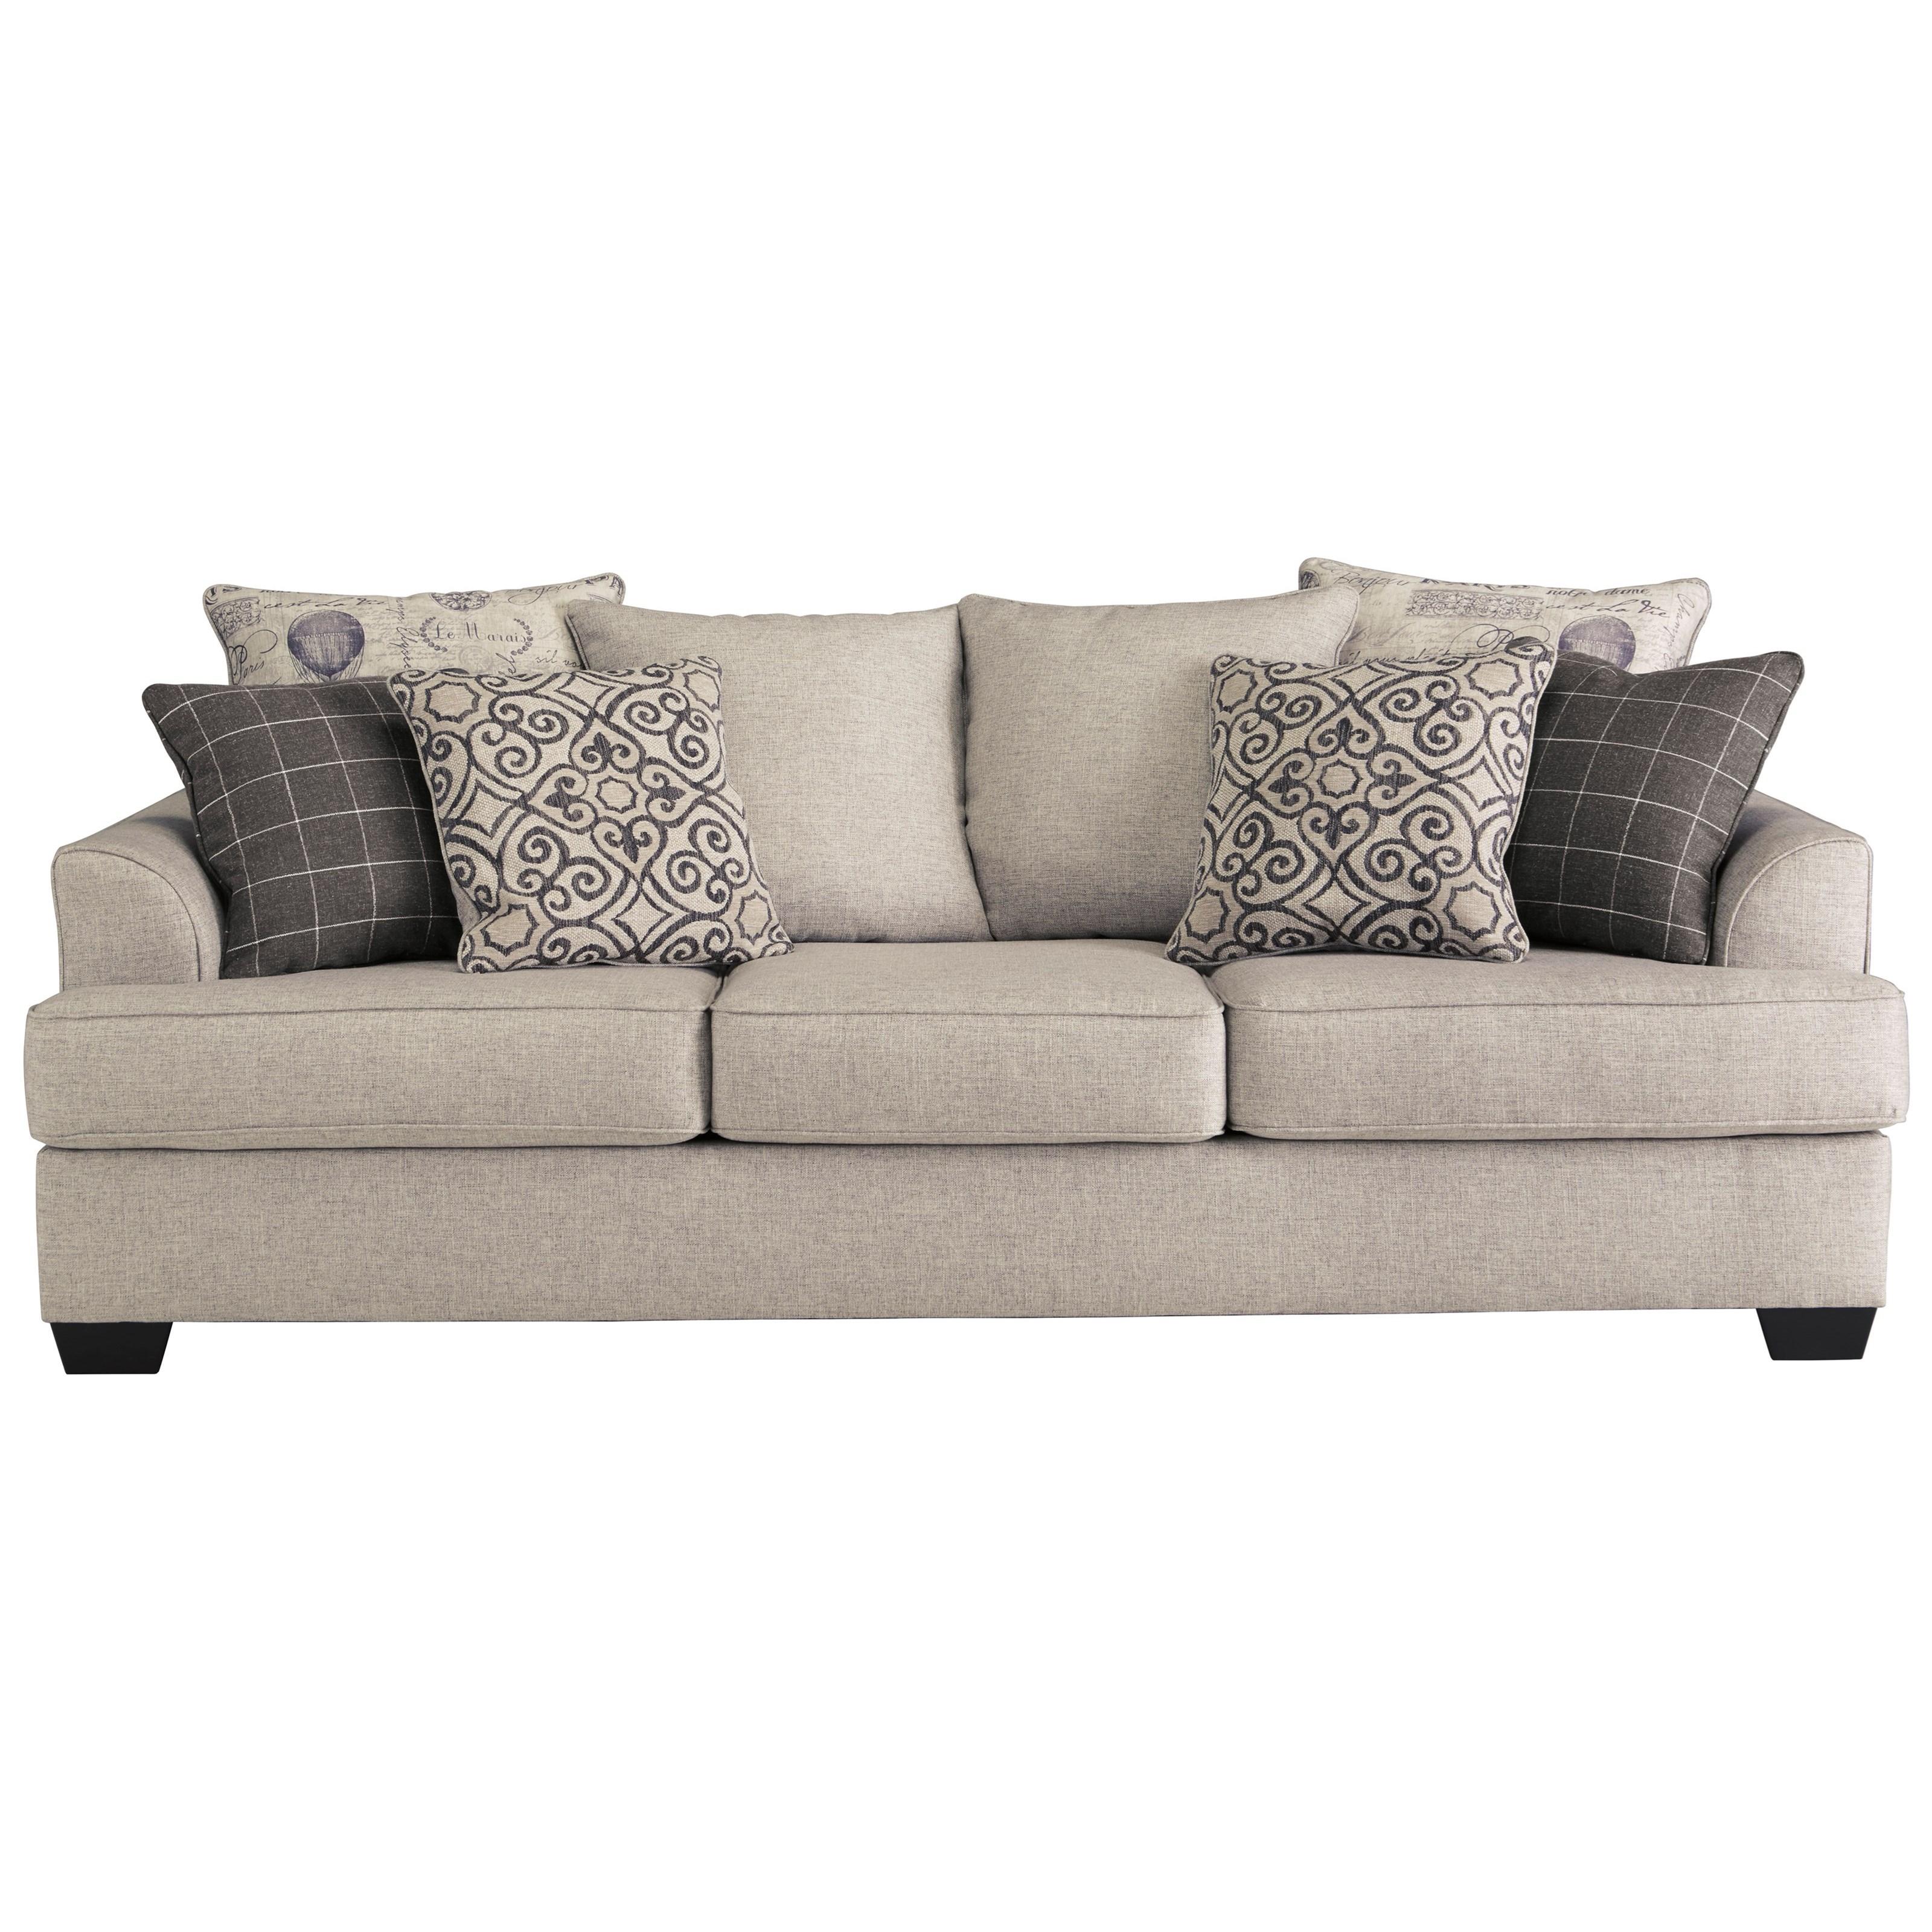 Sam Levitz Furniture